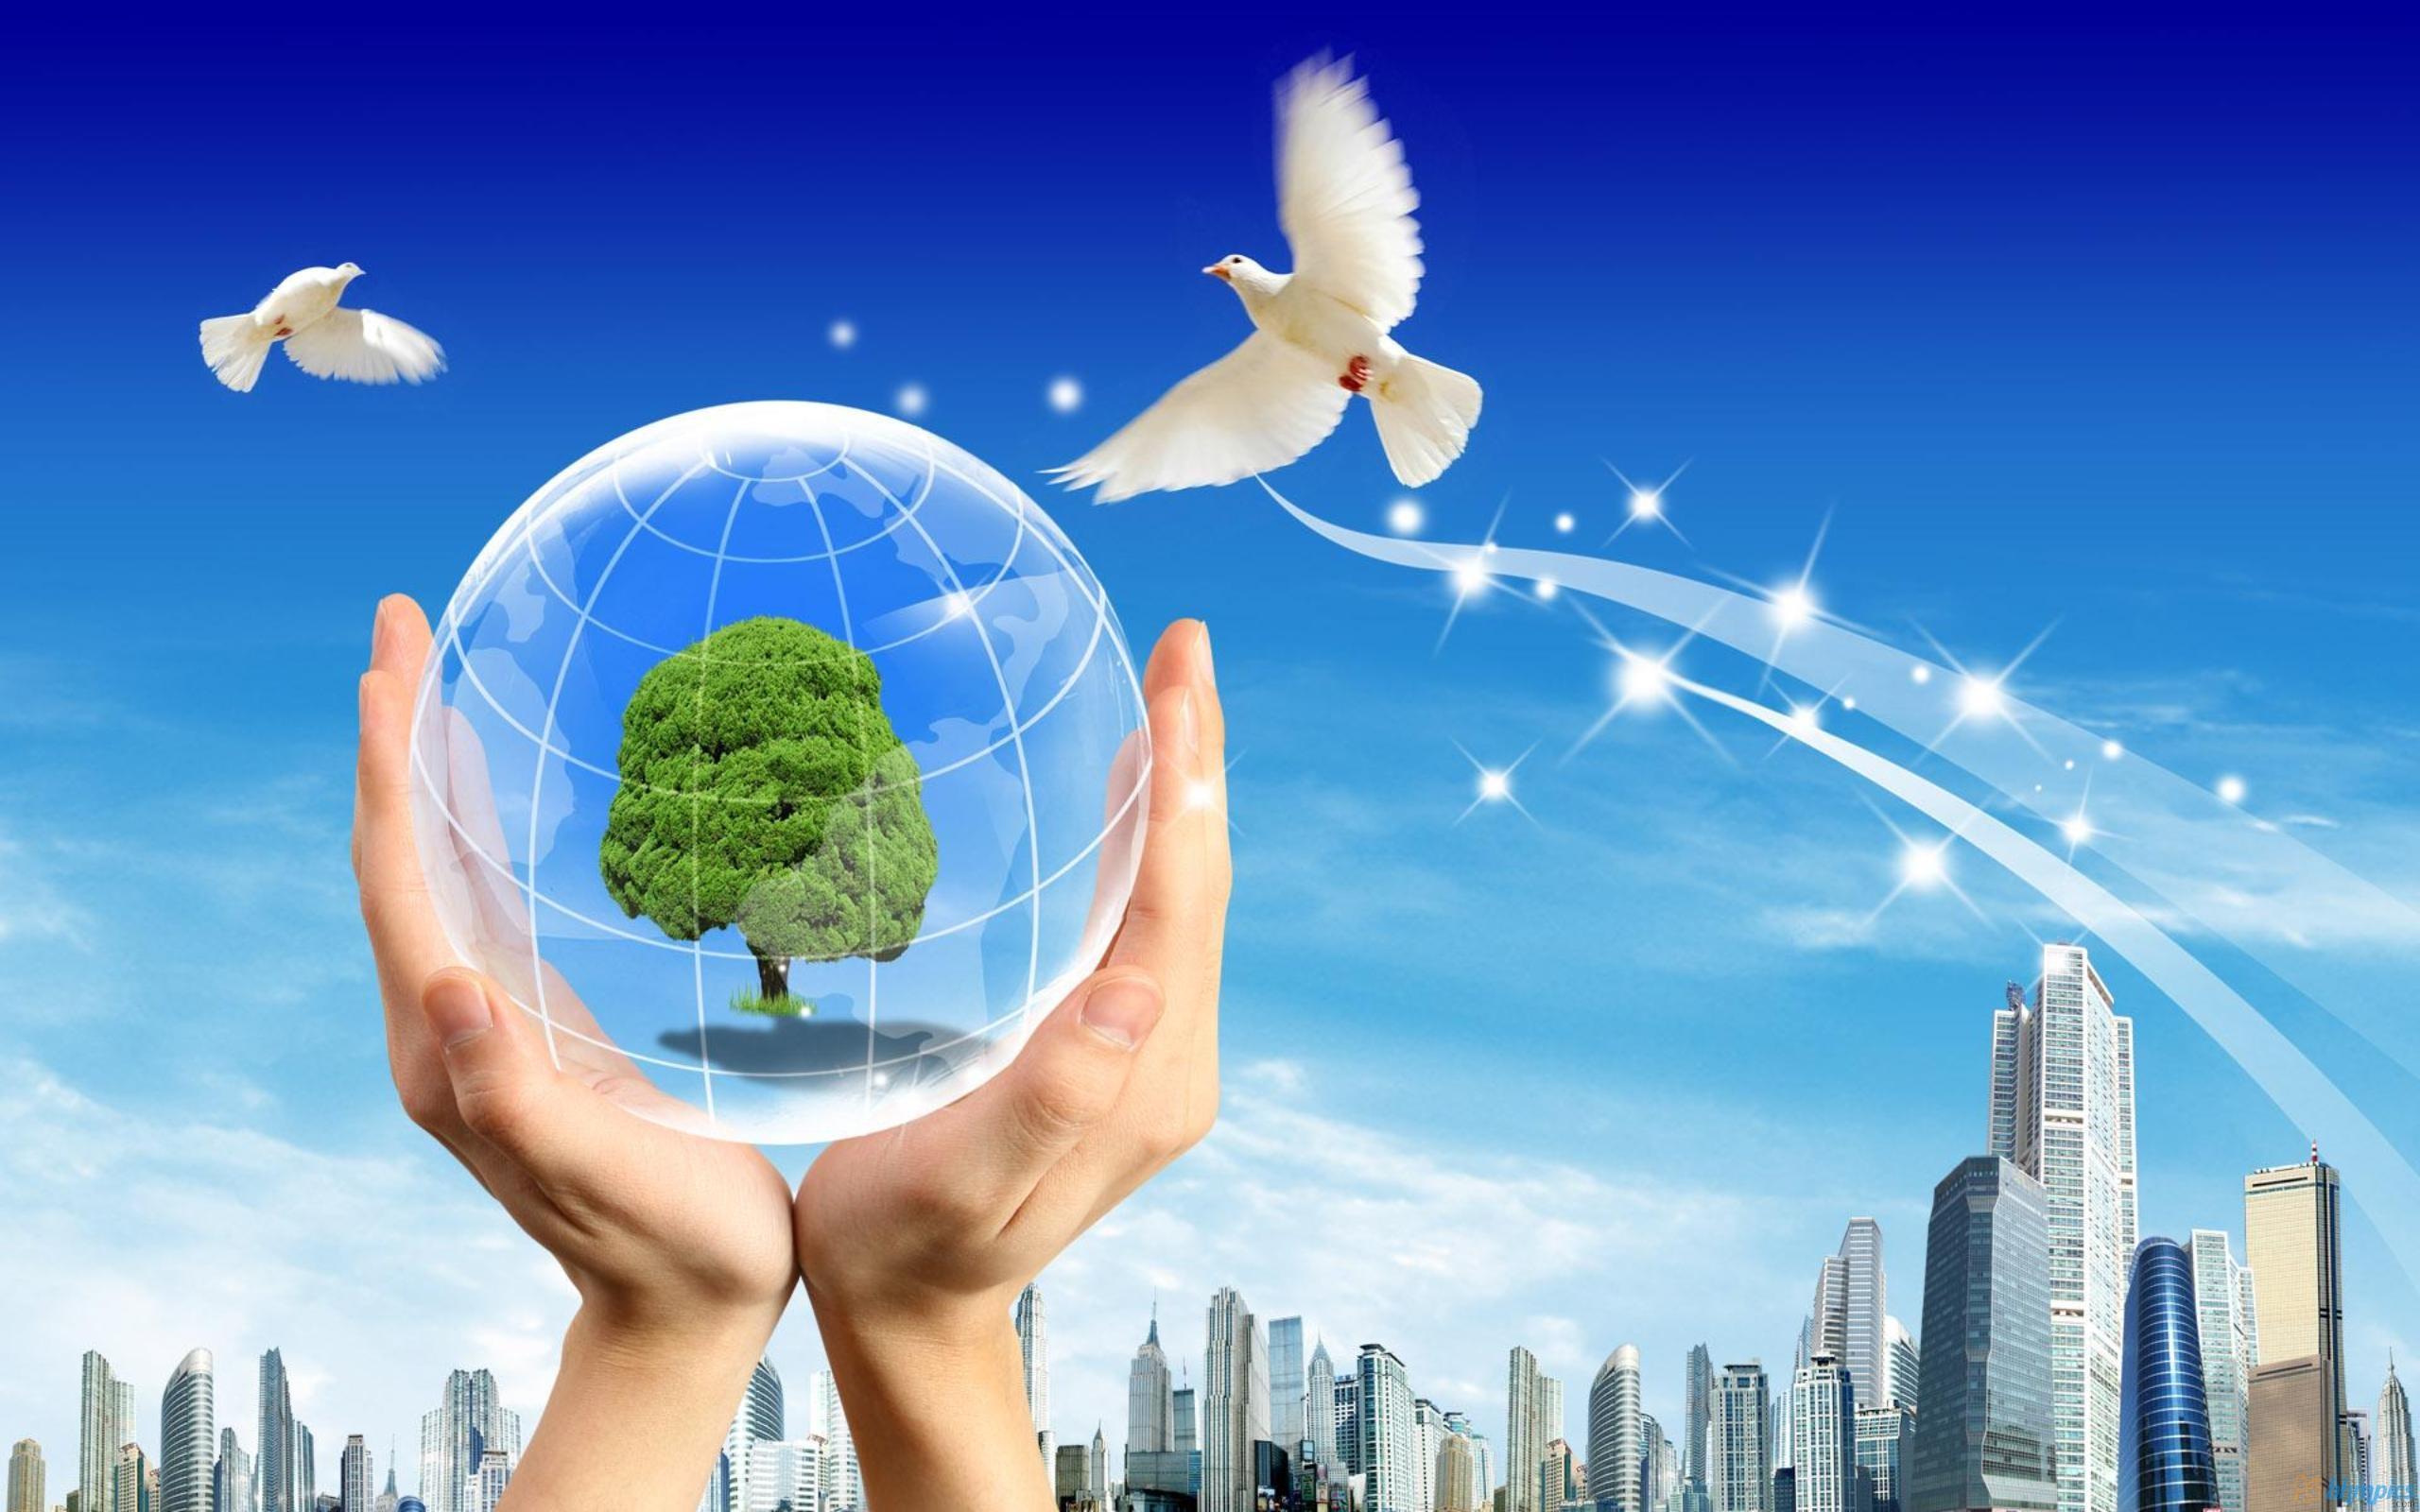 615615-save-green-earth